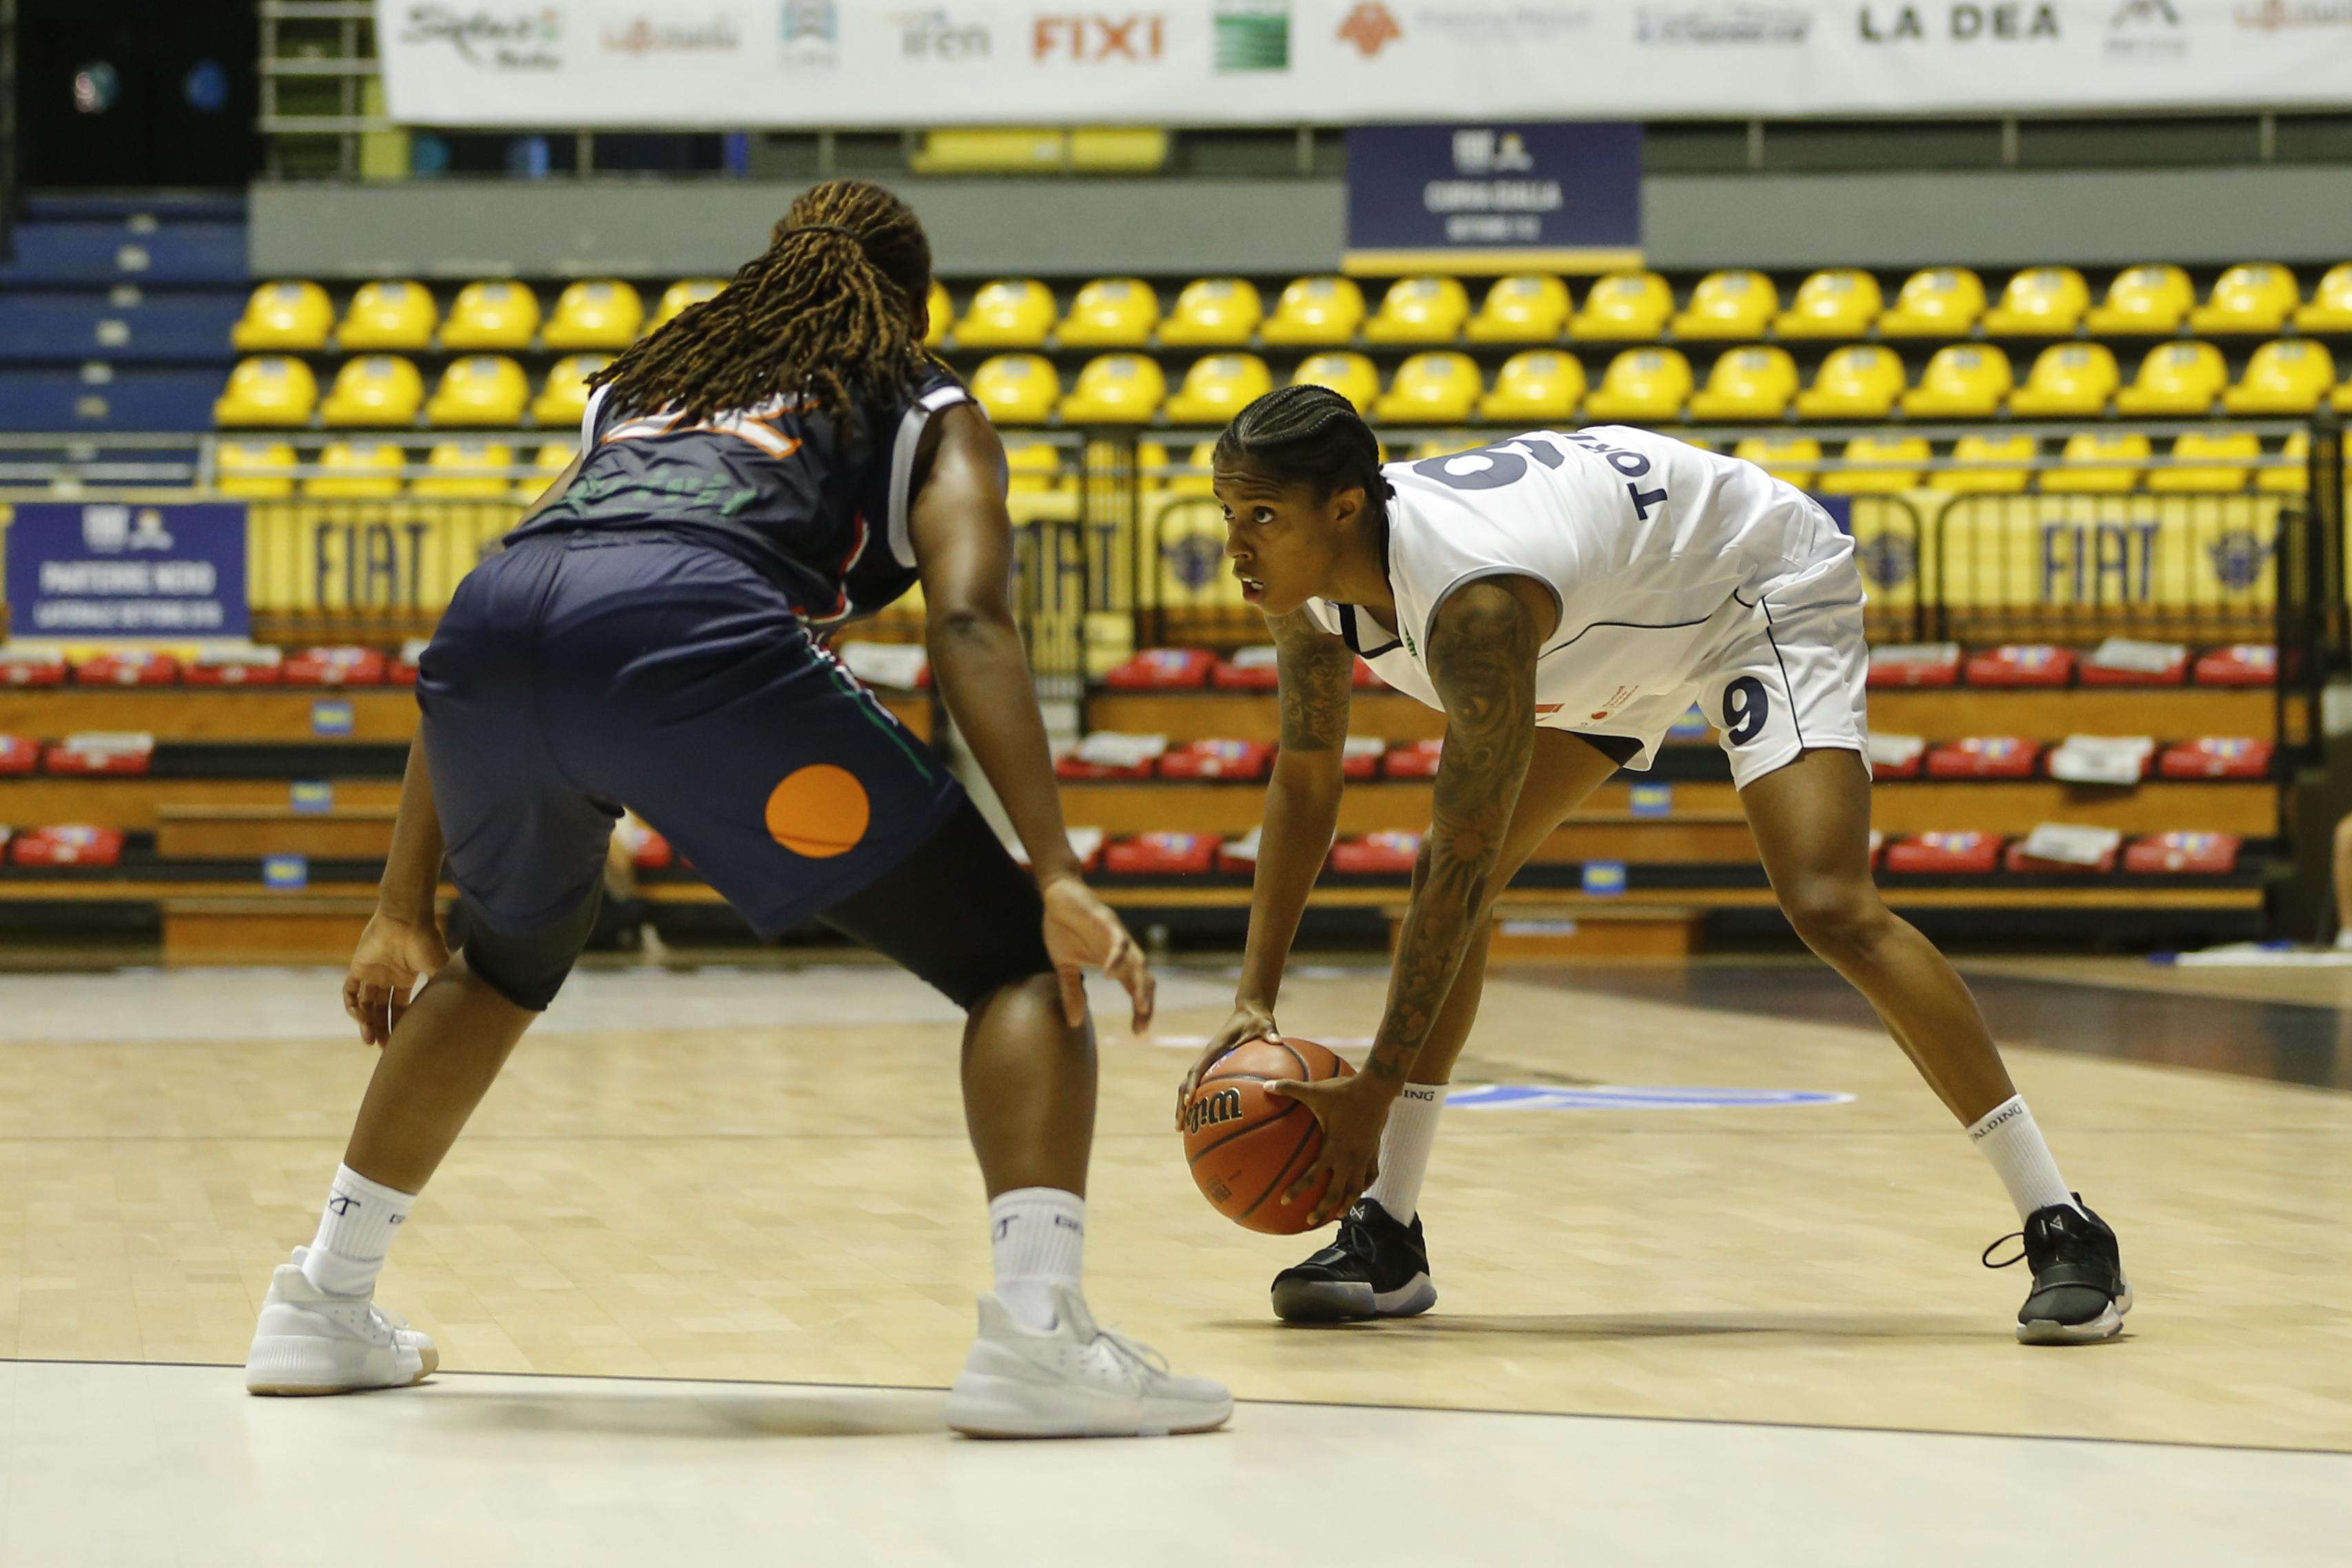 Lega Basket Femminile GU2TOCUP 2017-18: la Fixi Torino tramortita da Schio